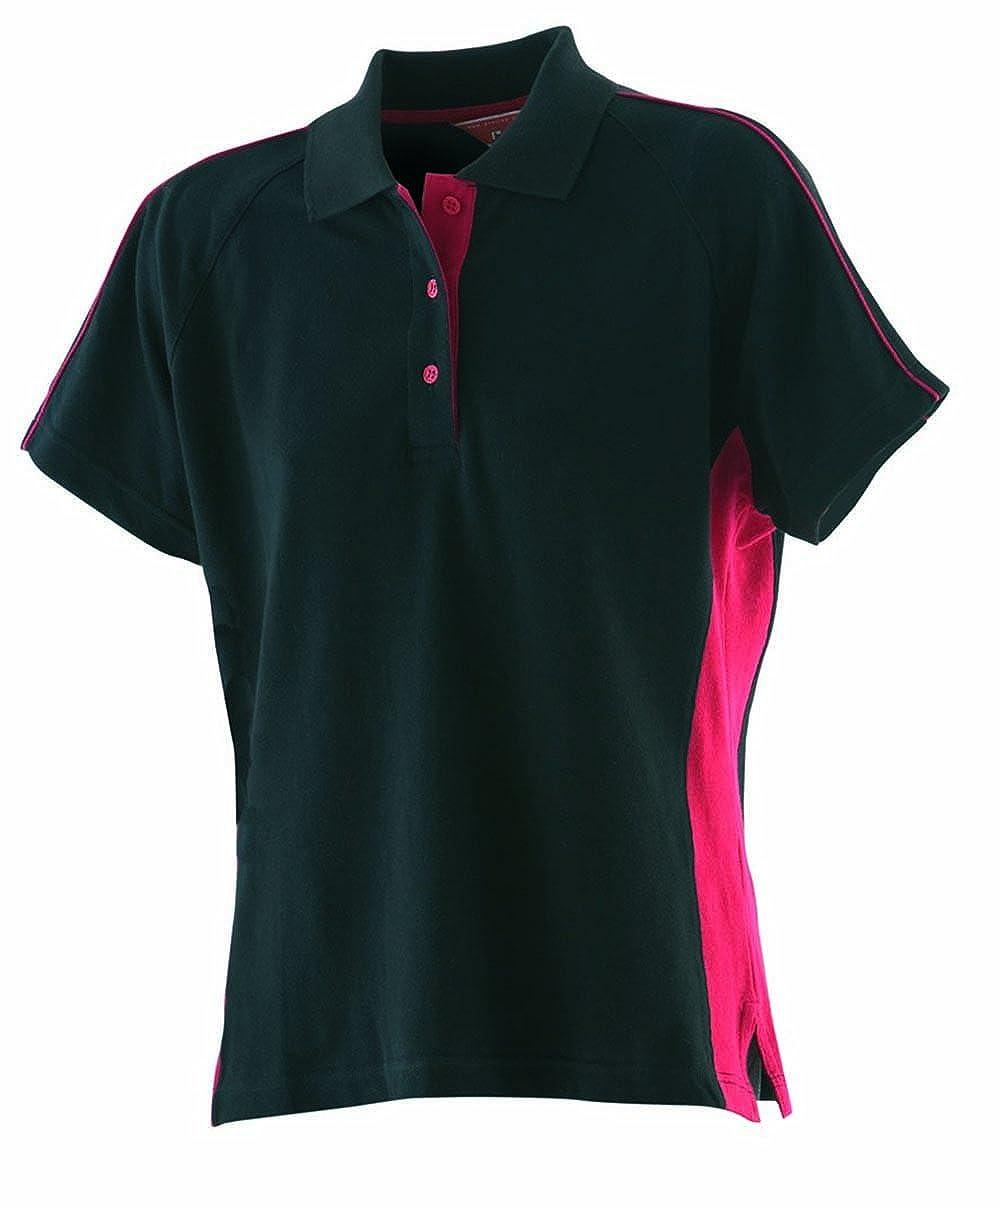 Finden & Hales - Polo deportivo para mujer